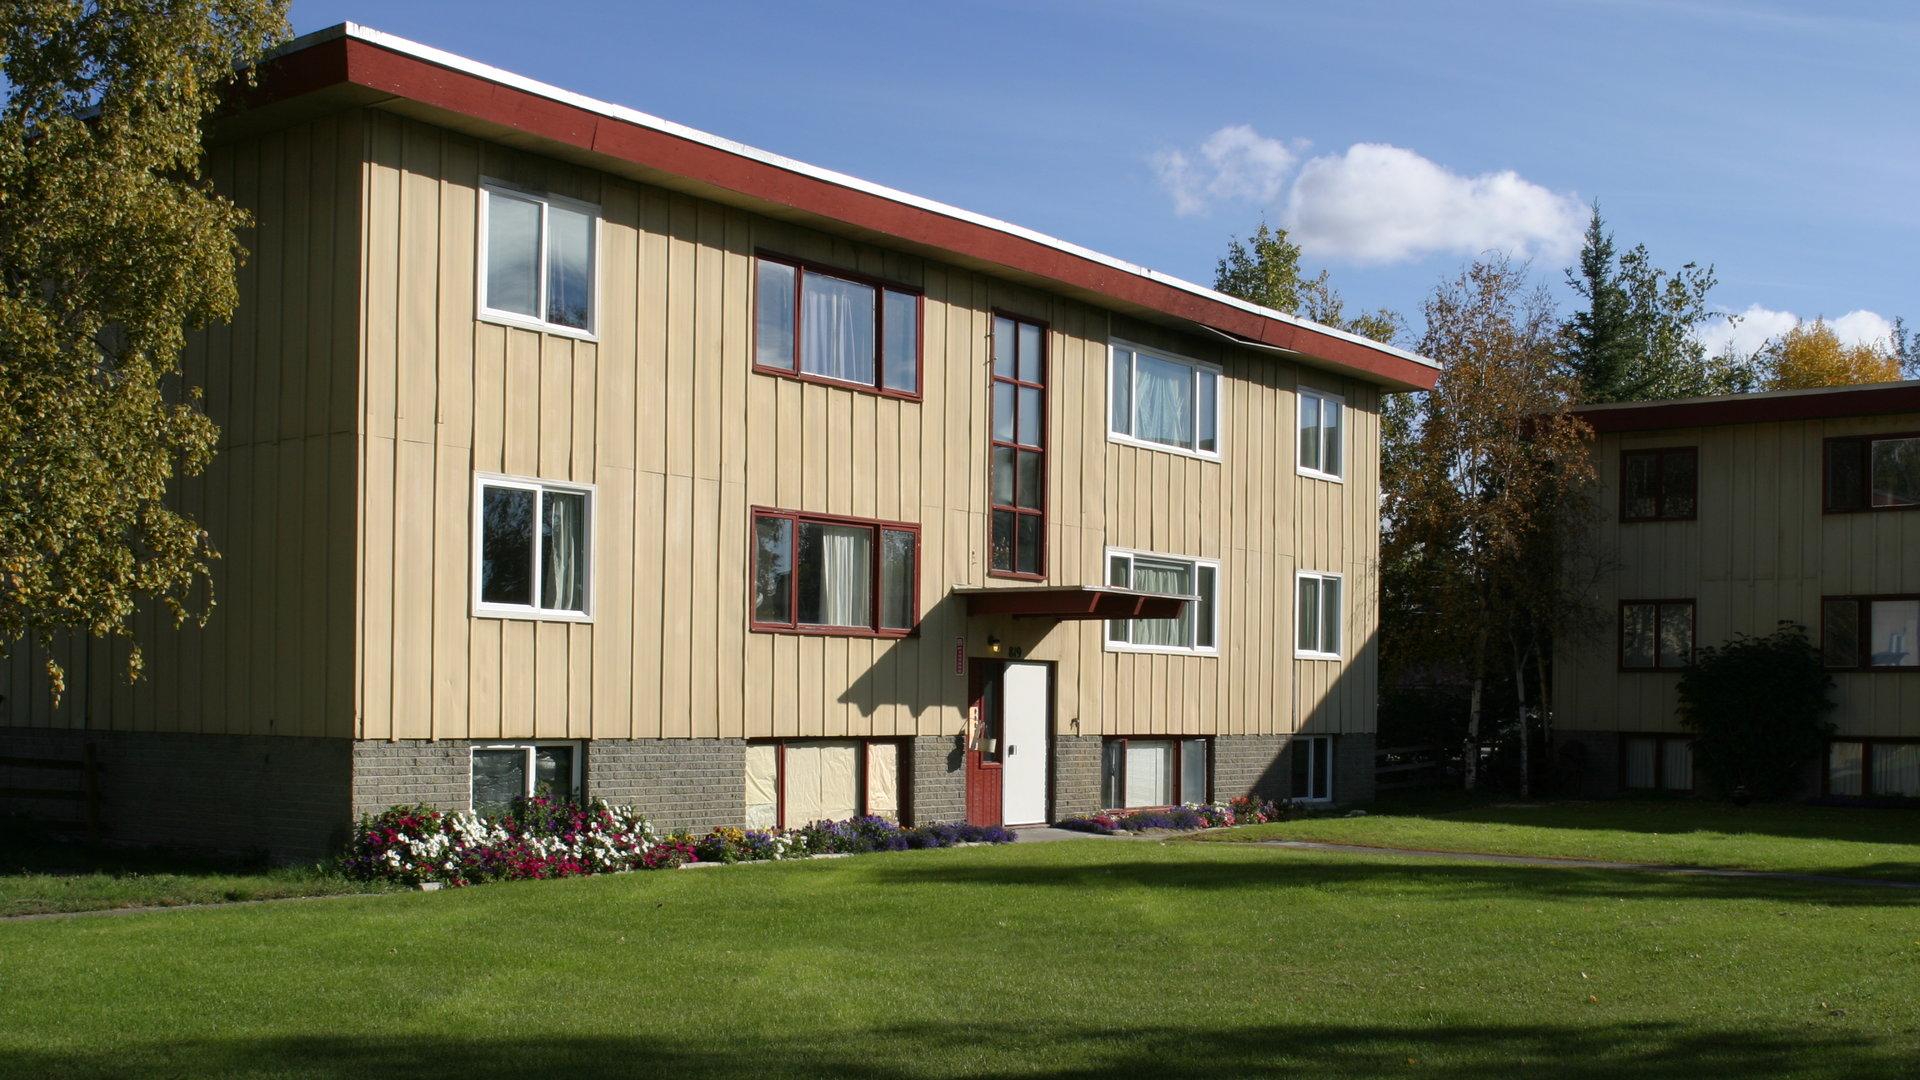 22 Apartments for Rent in Fairbanks, AK | ApartmentRatings©